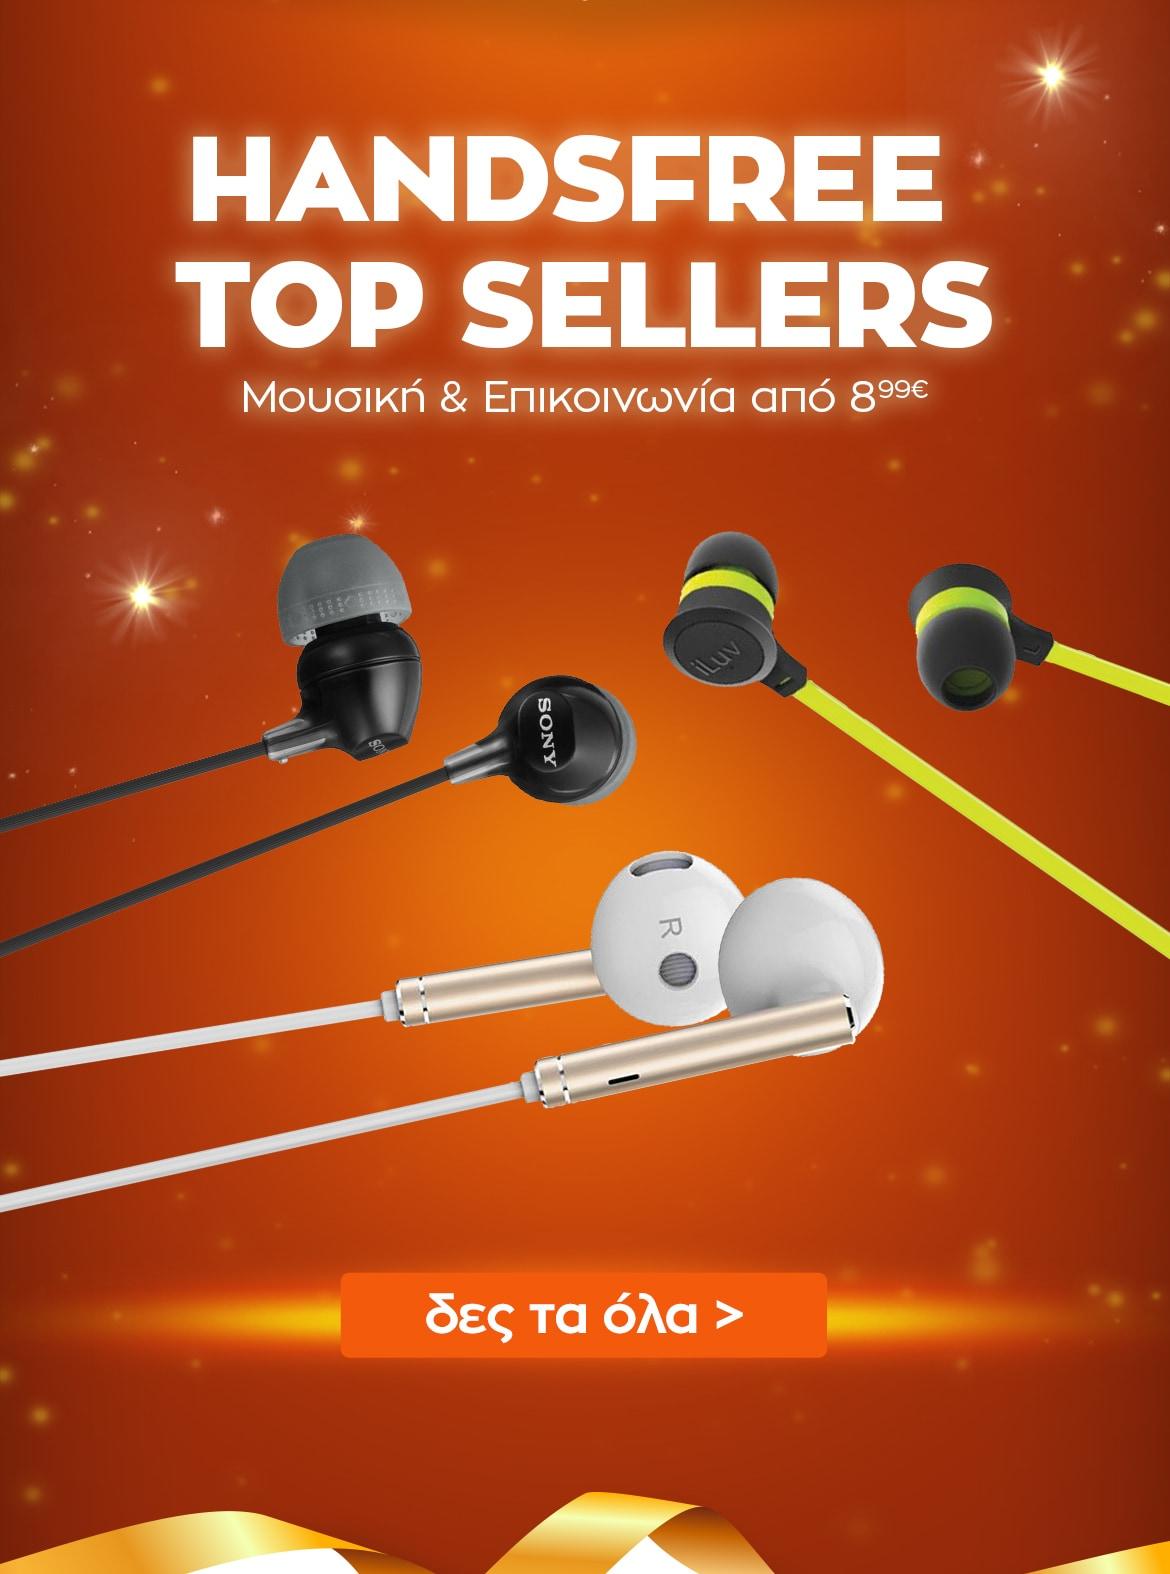 04_handsfree_top_sellers